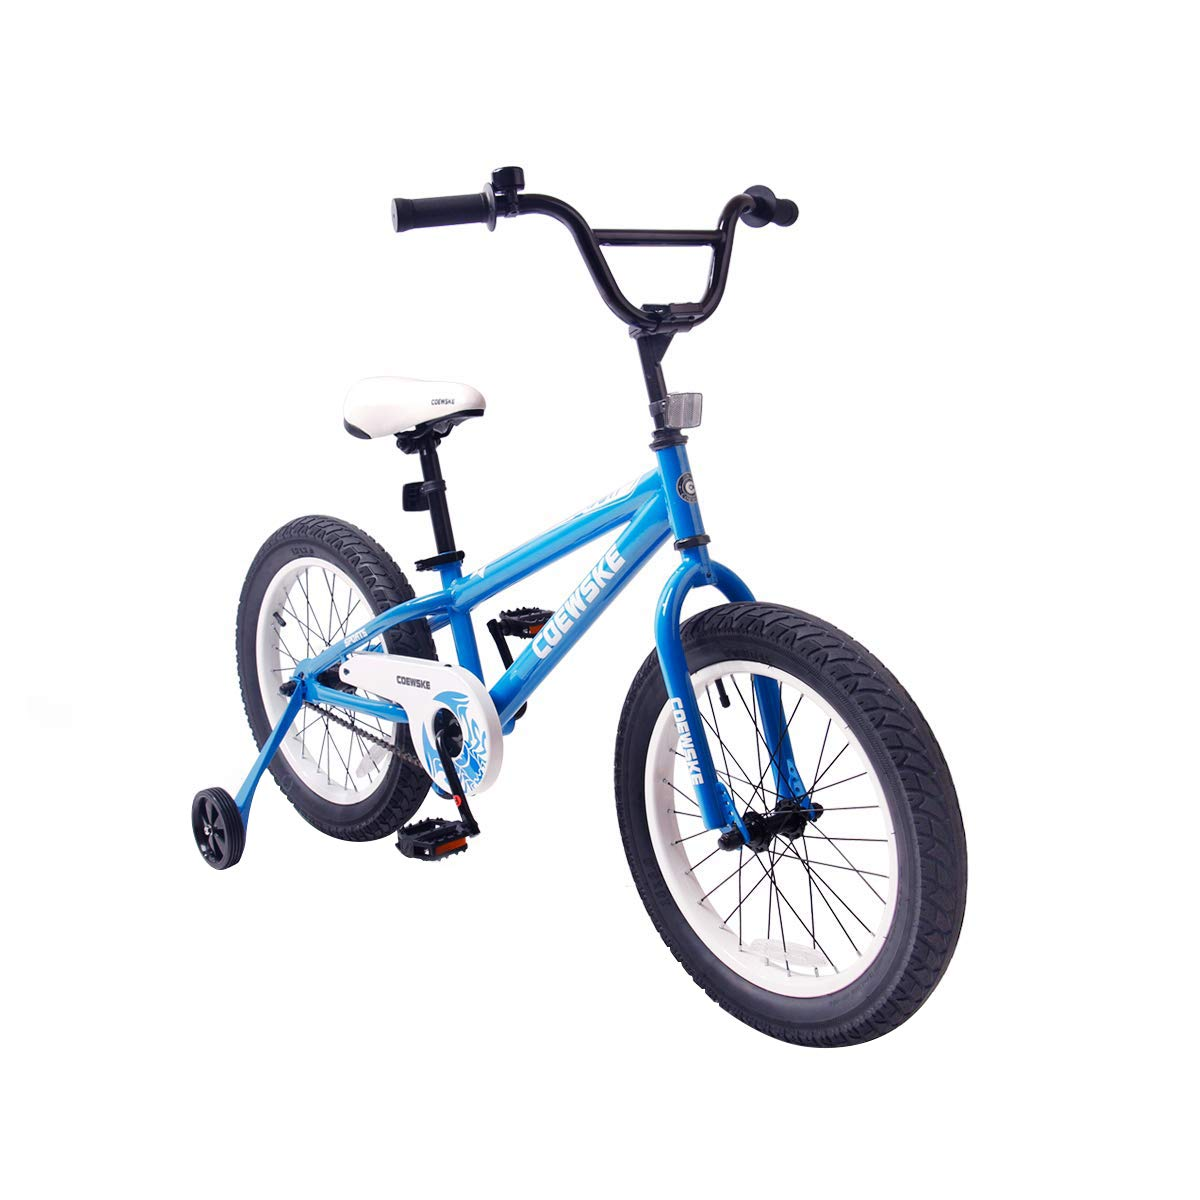 Magicshine Helmet Mount, Bike Light Helmet Mounting Kit, 1x Helmet Mount 1x Round Plug Extension Cable, Compatible 9 Series Bicycle Lights and Bluetooth Series Bike Lights.